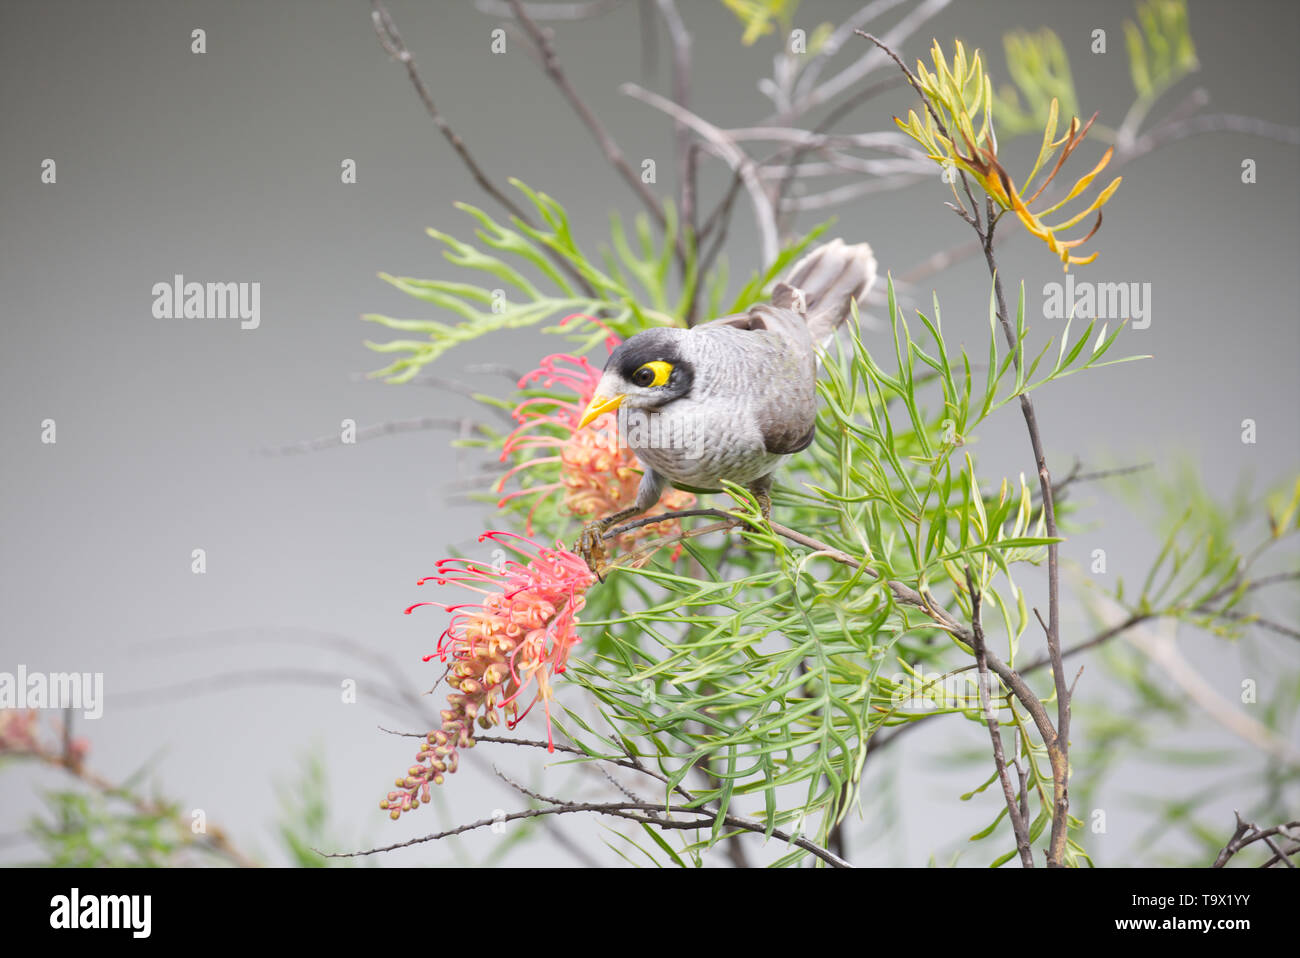 A noisy miner bird feeding on a Grevillea bush - Stock Image